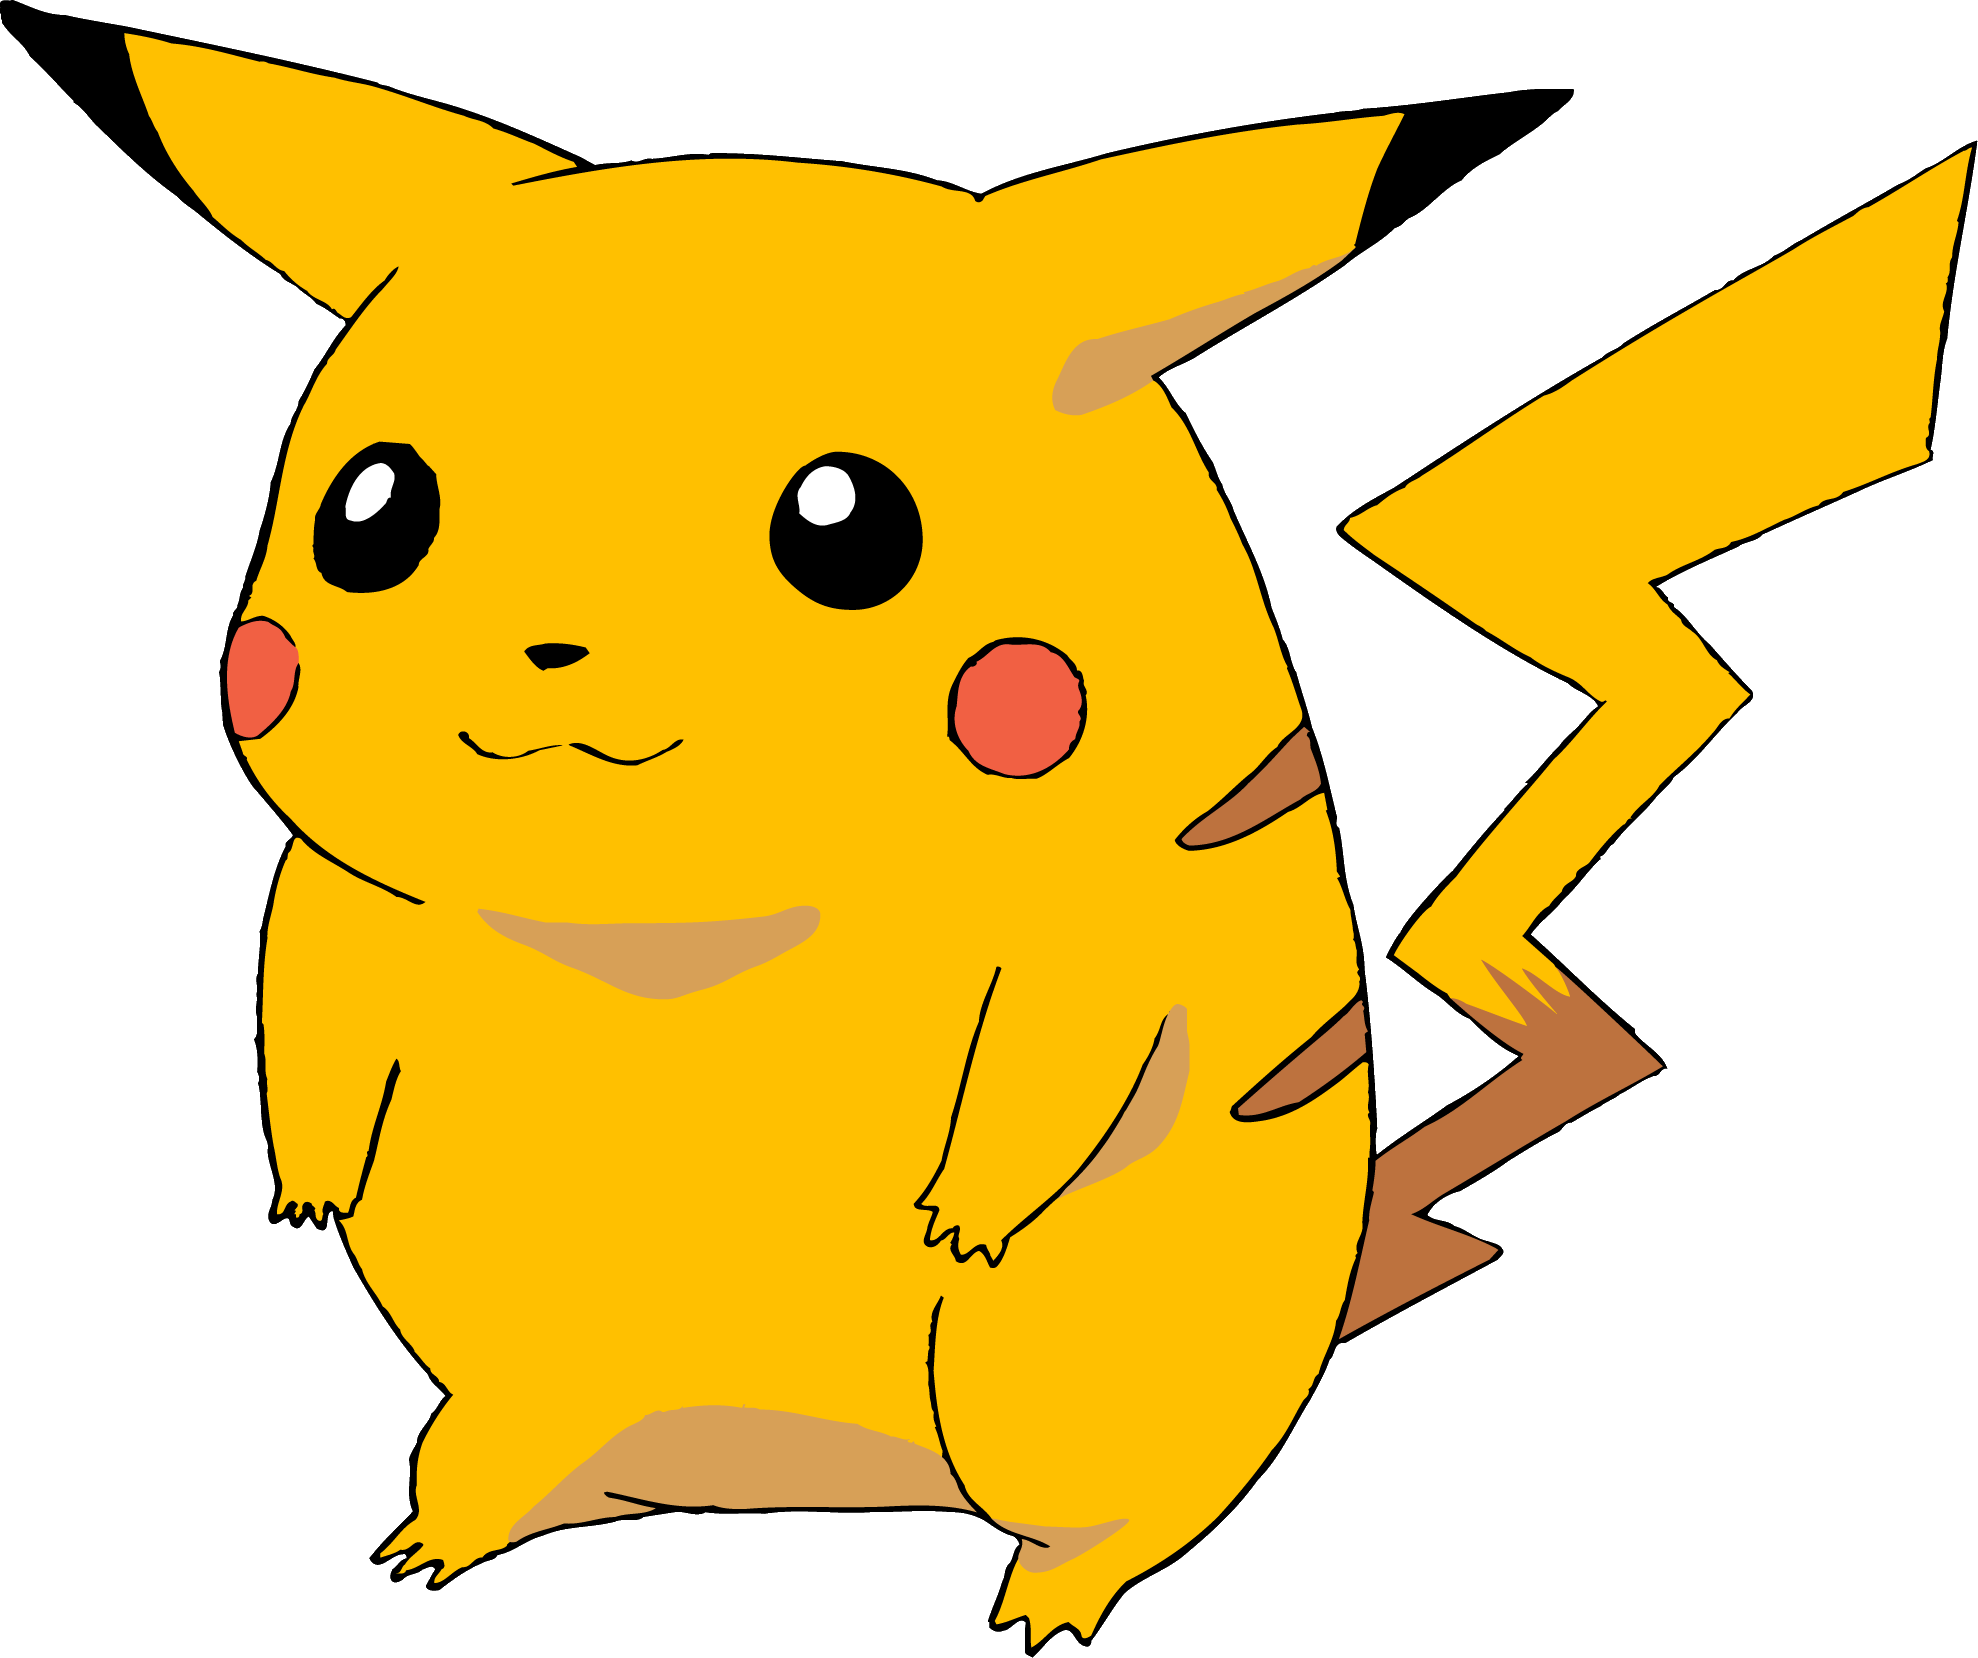 Diy pokemon pikachu costume keeping it simple crafts diy pokemon pikachu costume pronofoot35fo Gallery